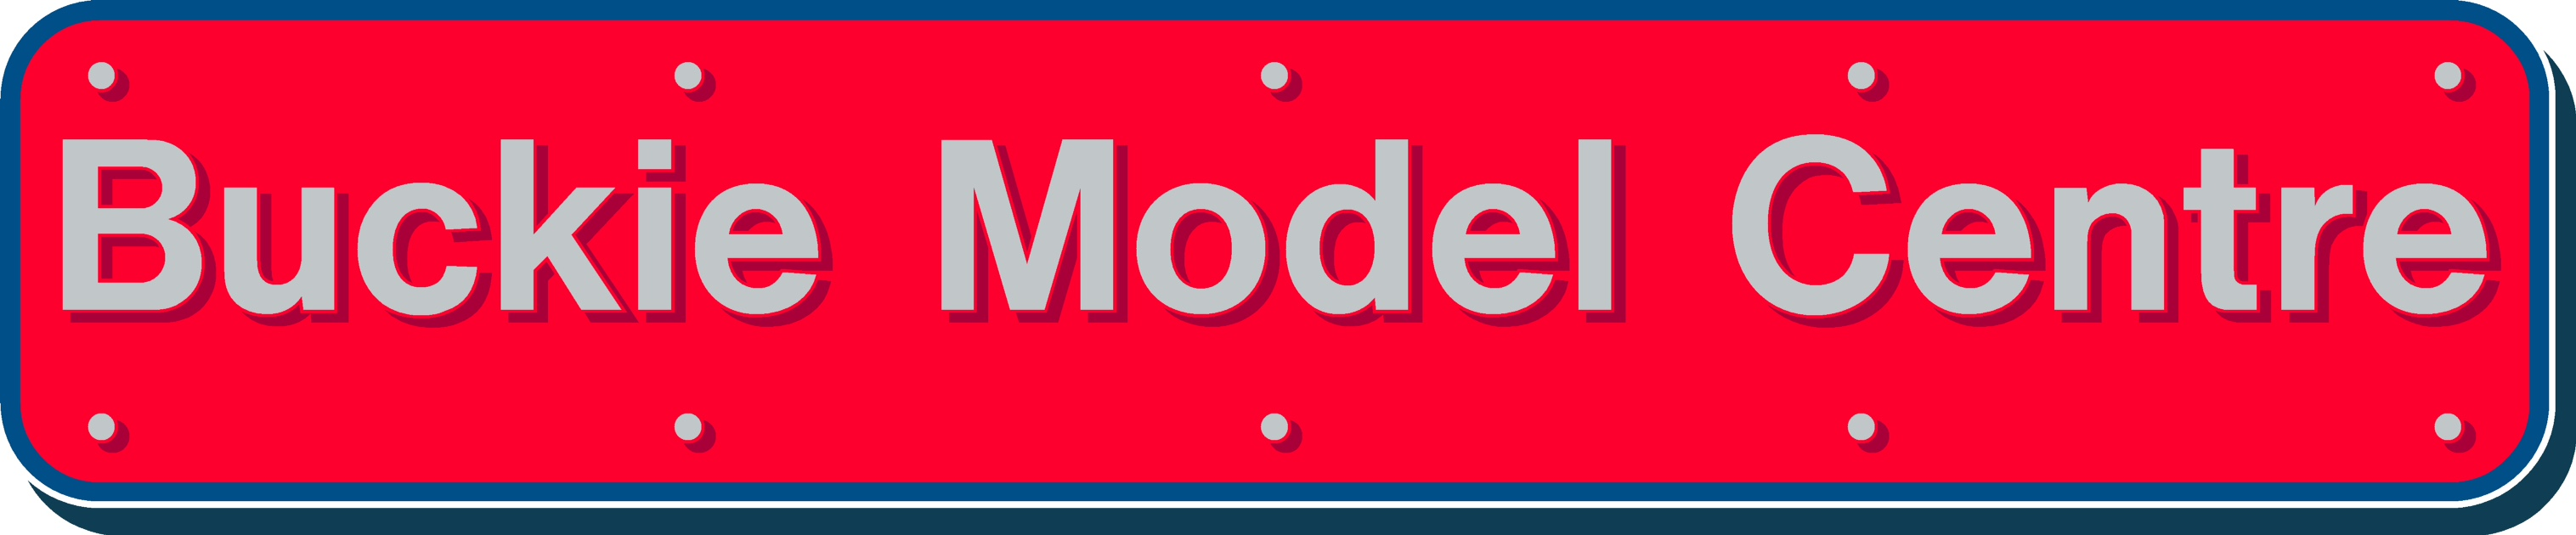 Buckie Model Centre